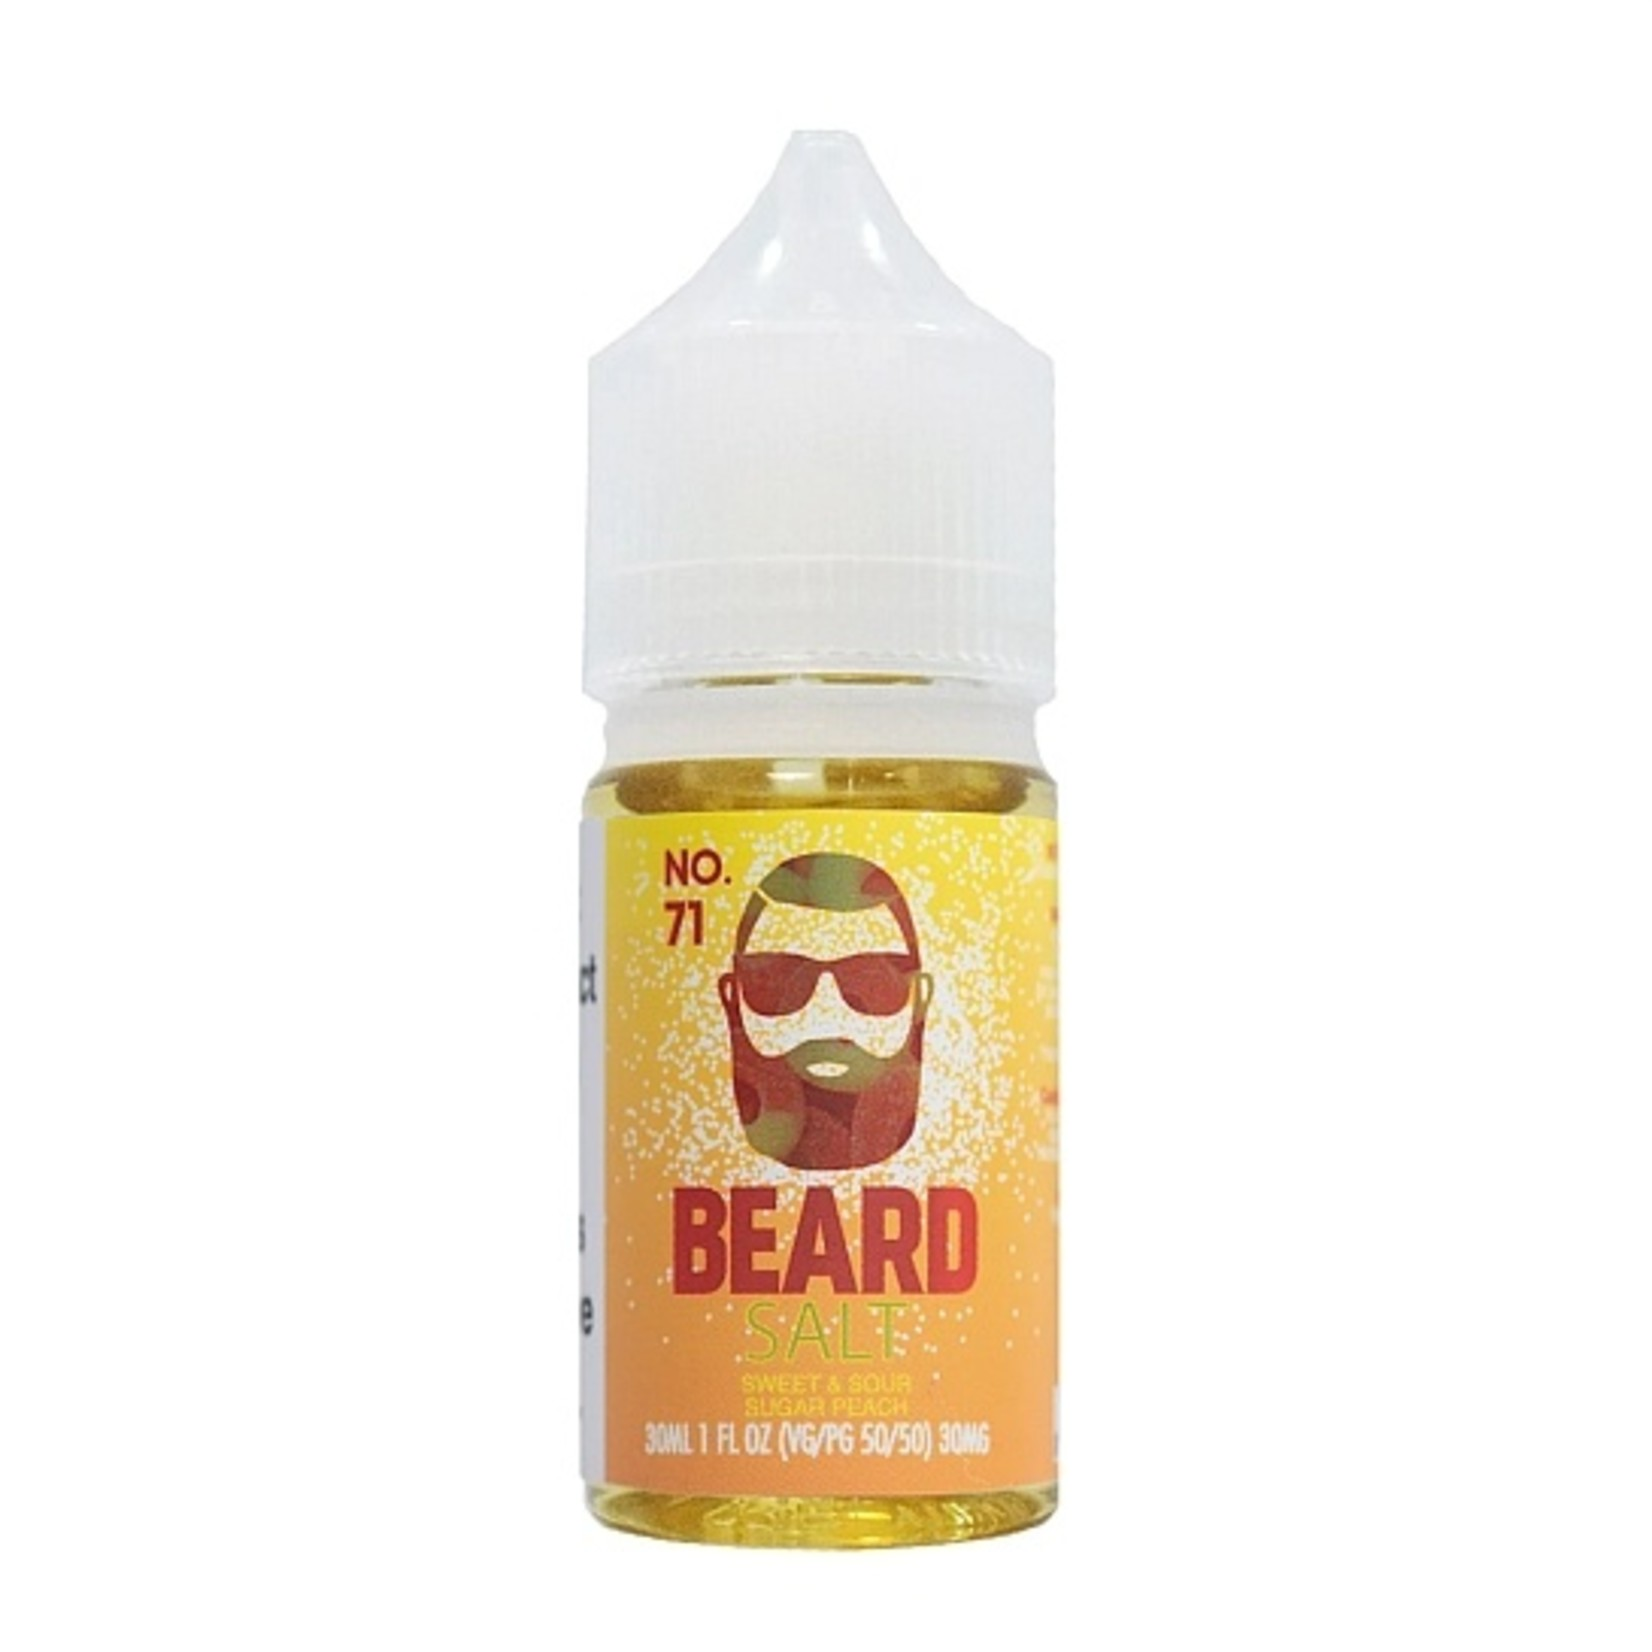 Beard Vape Co. Beard No 71 Nic Salt